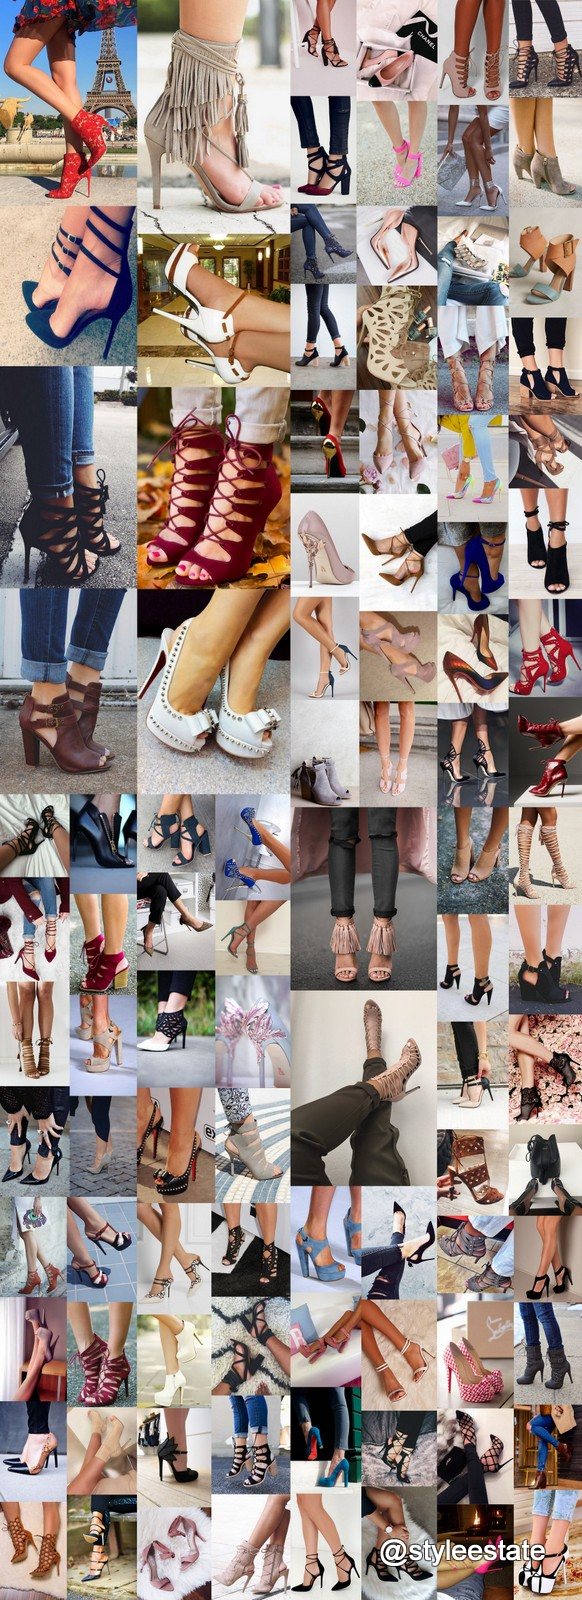 101 Chic Designer Heels Are Trending Hot Right Now